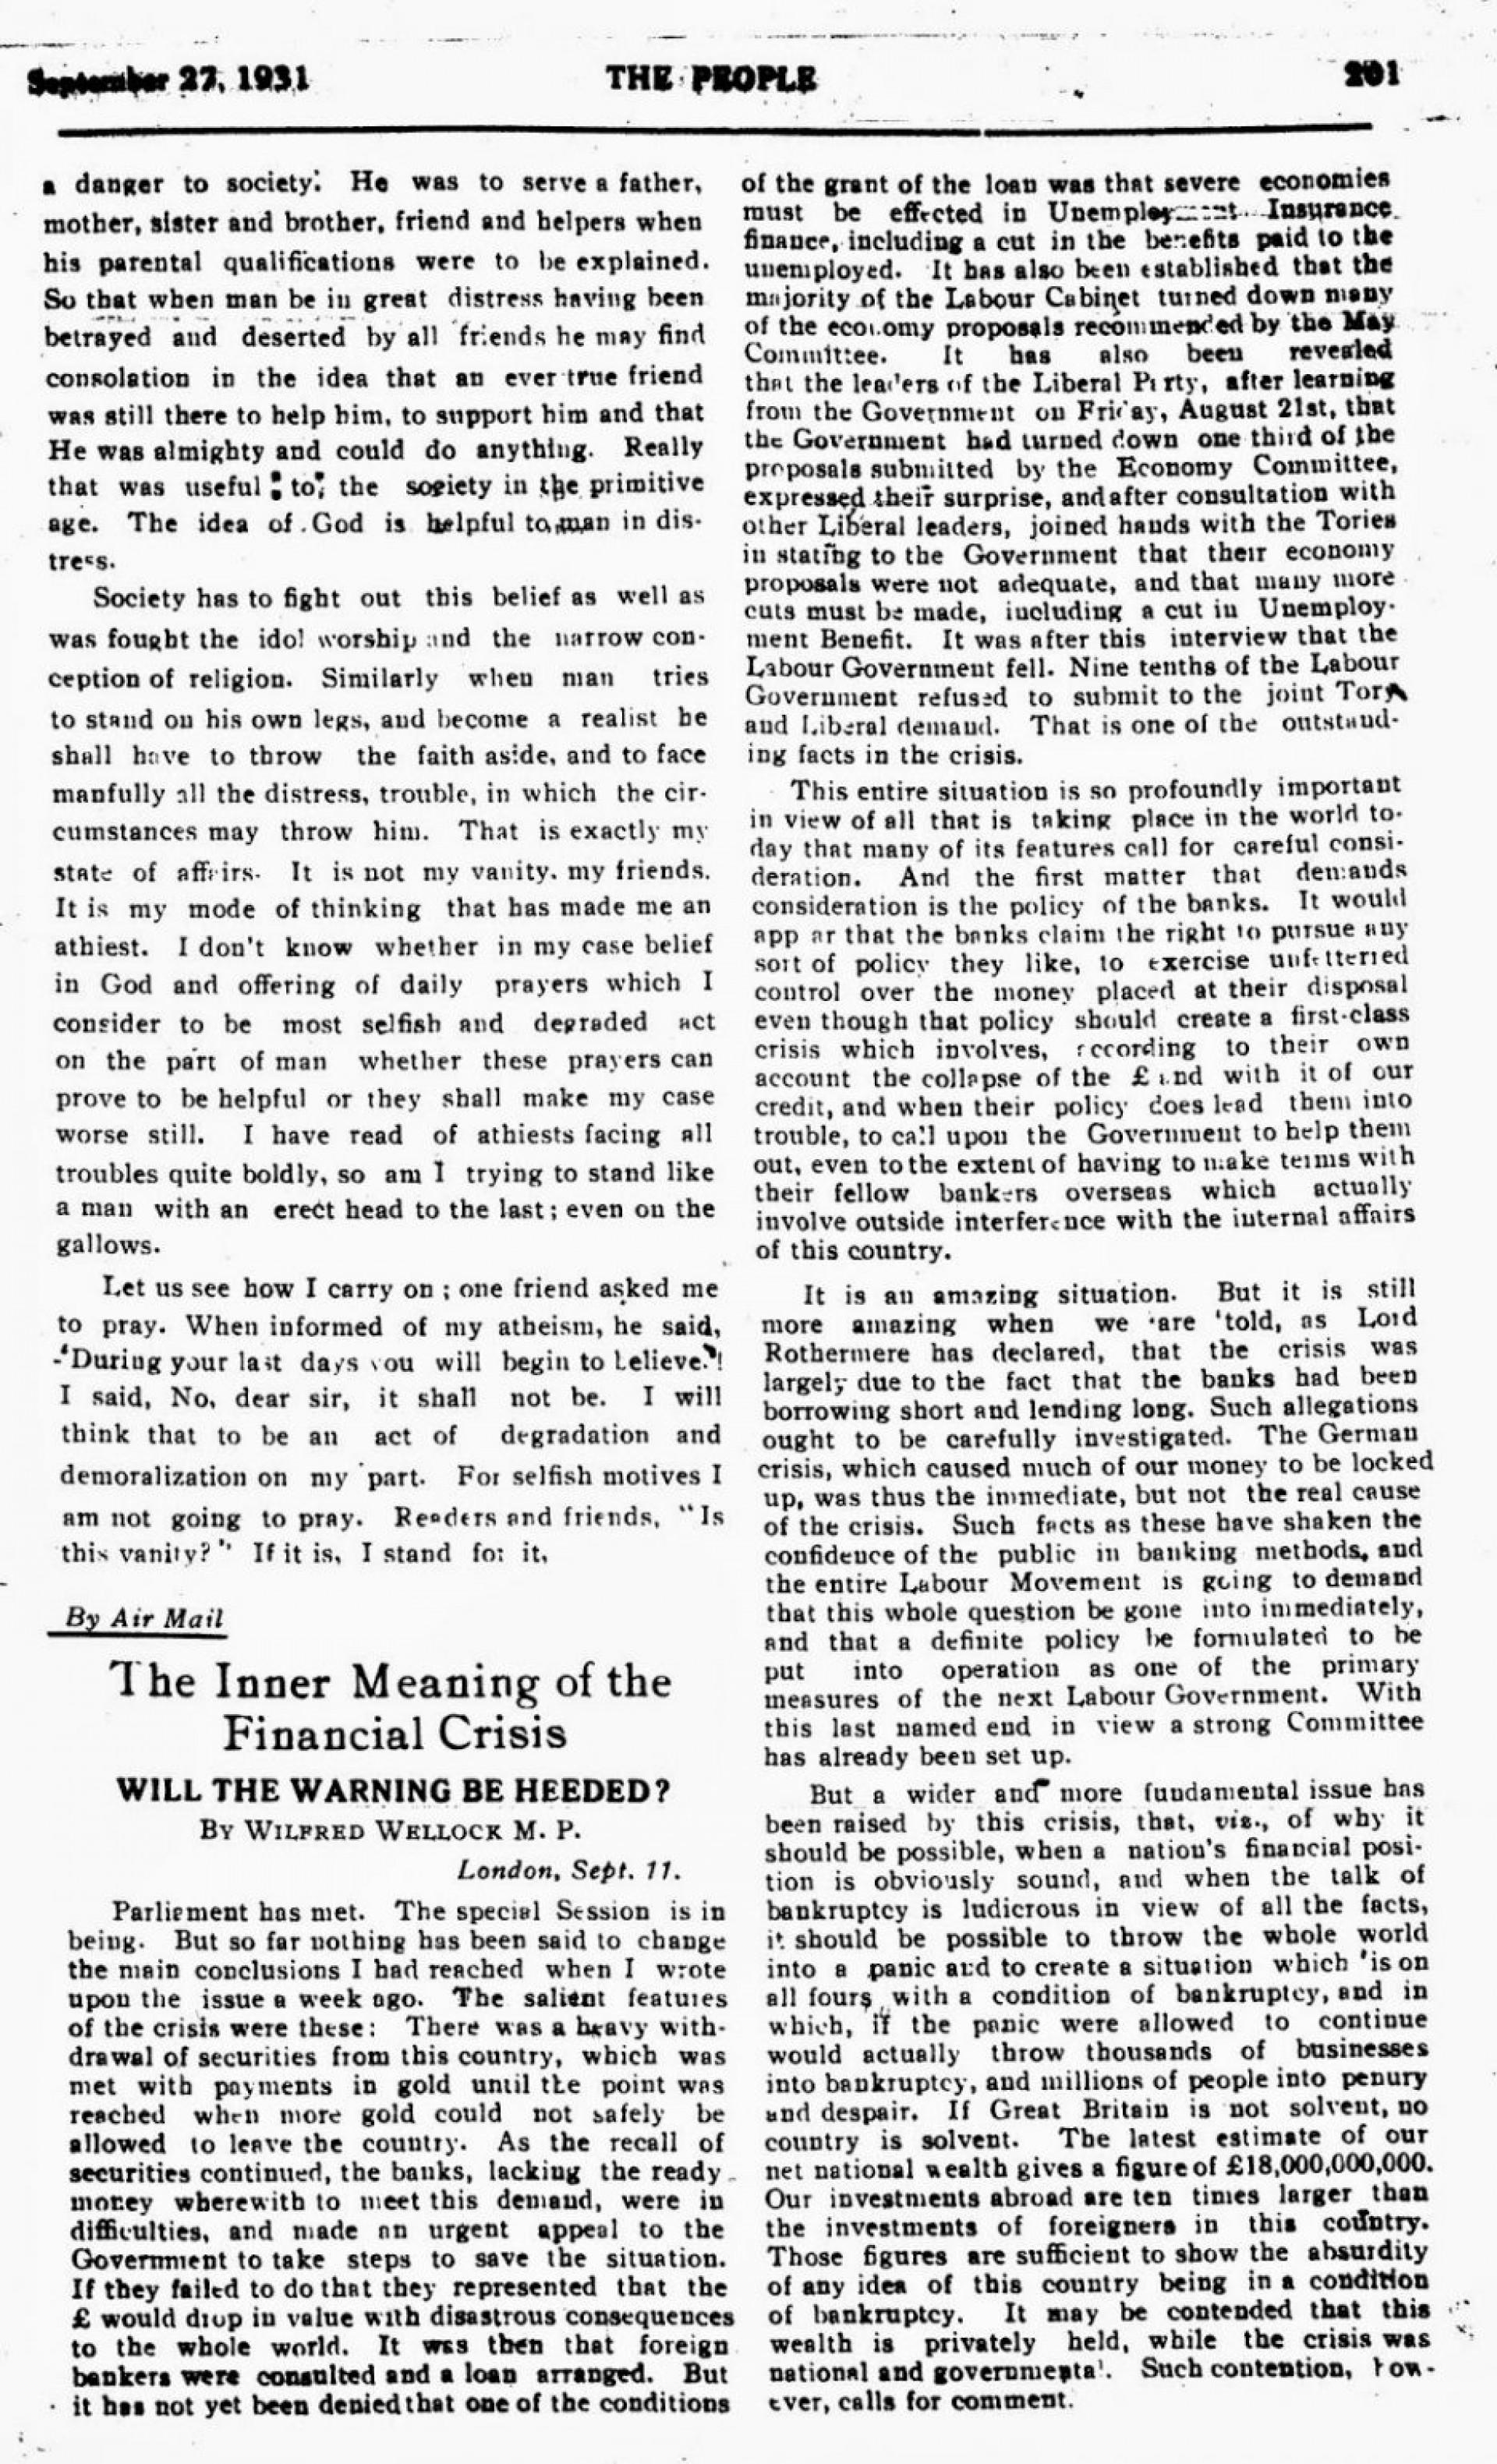 006 Essay On Bhagat Singh In Marathi Urdu Punjabi Kannada Telugu Hindi Sanskrit English Language Words Short 936x1541 Unique 100 1920